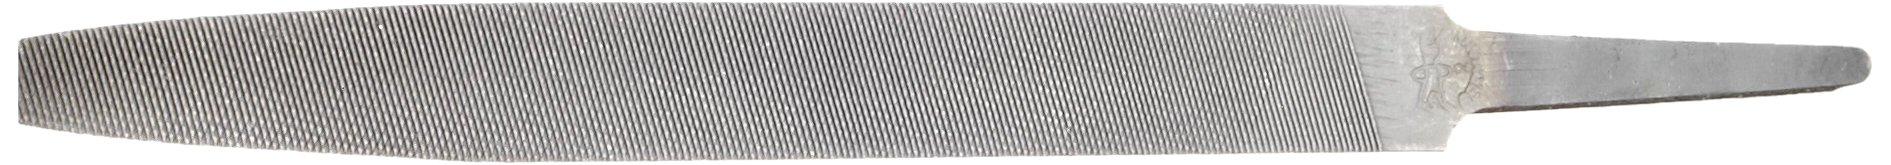 PFERD Hand File, American Pattern, Double Cut, Half-Round, Medium, 12'' Length, 1-1/8'' Width, 11/32'' Thickness